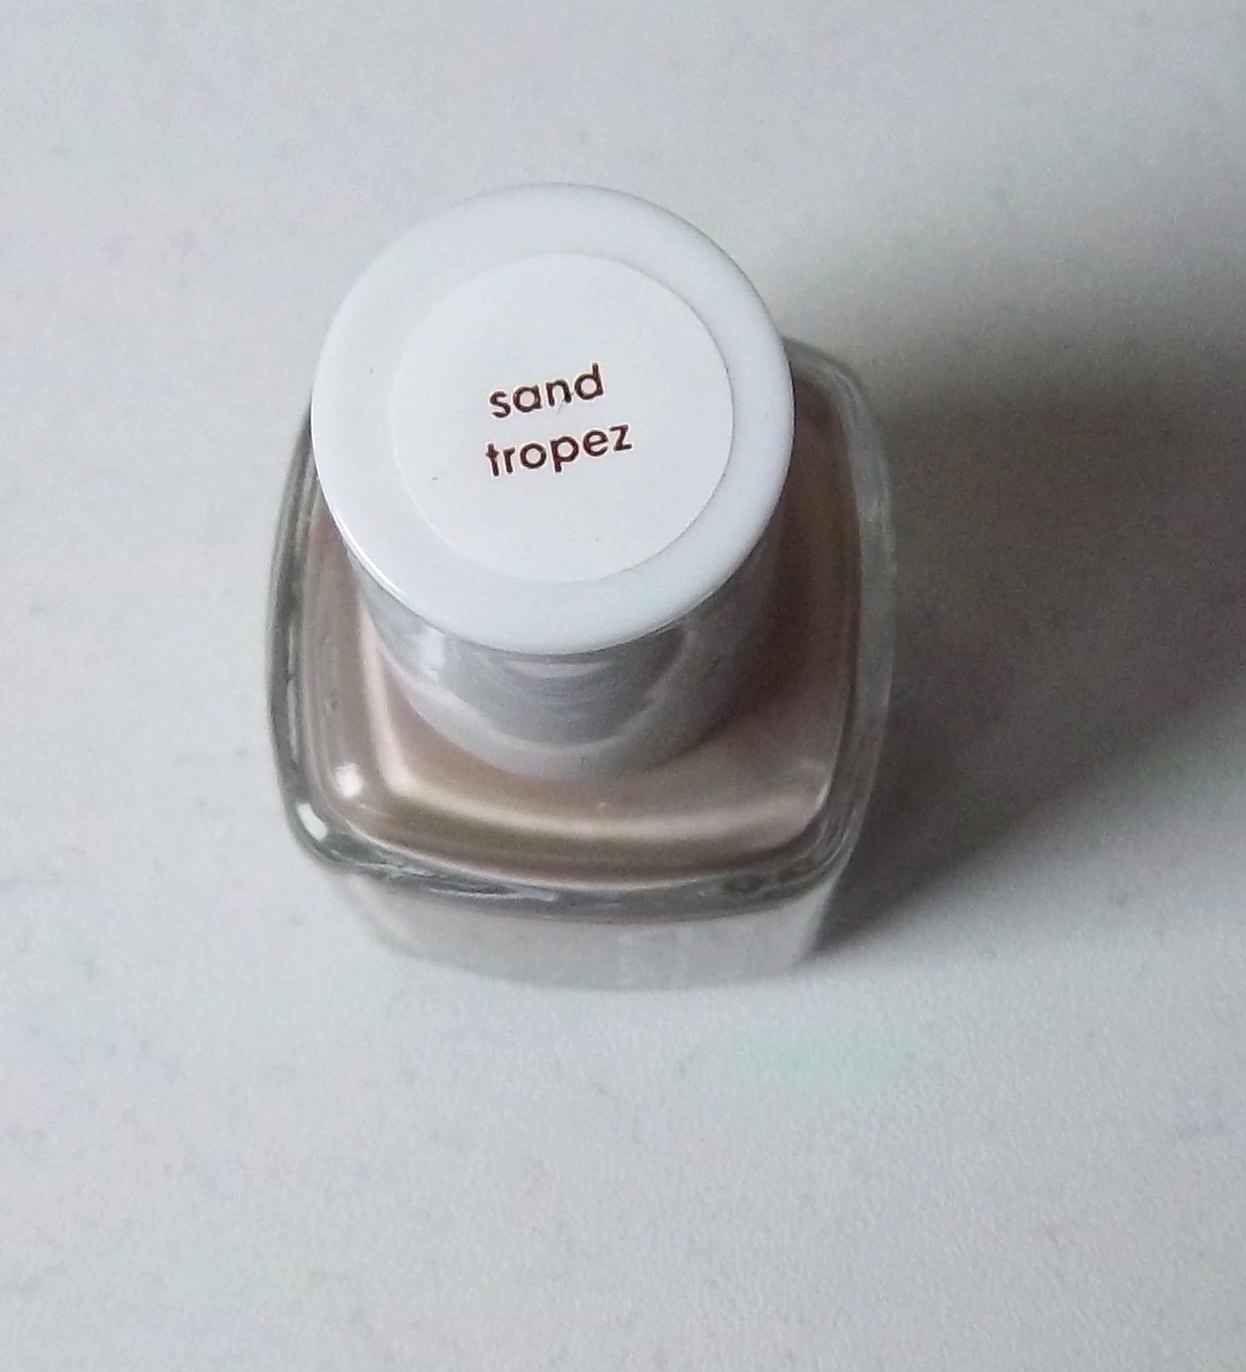 Oh my nail : Sand tropez